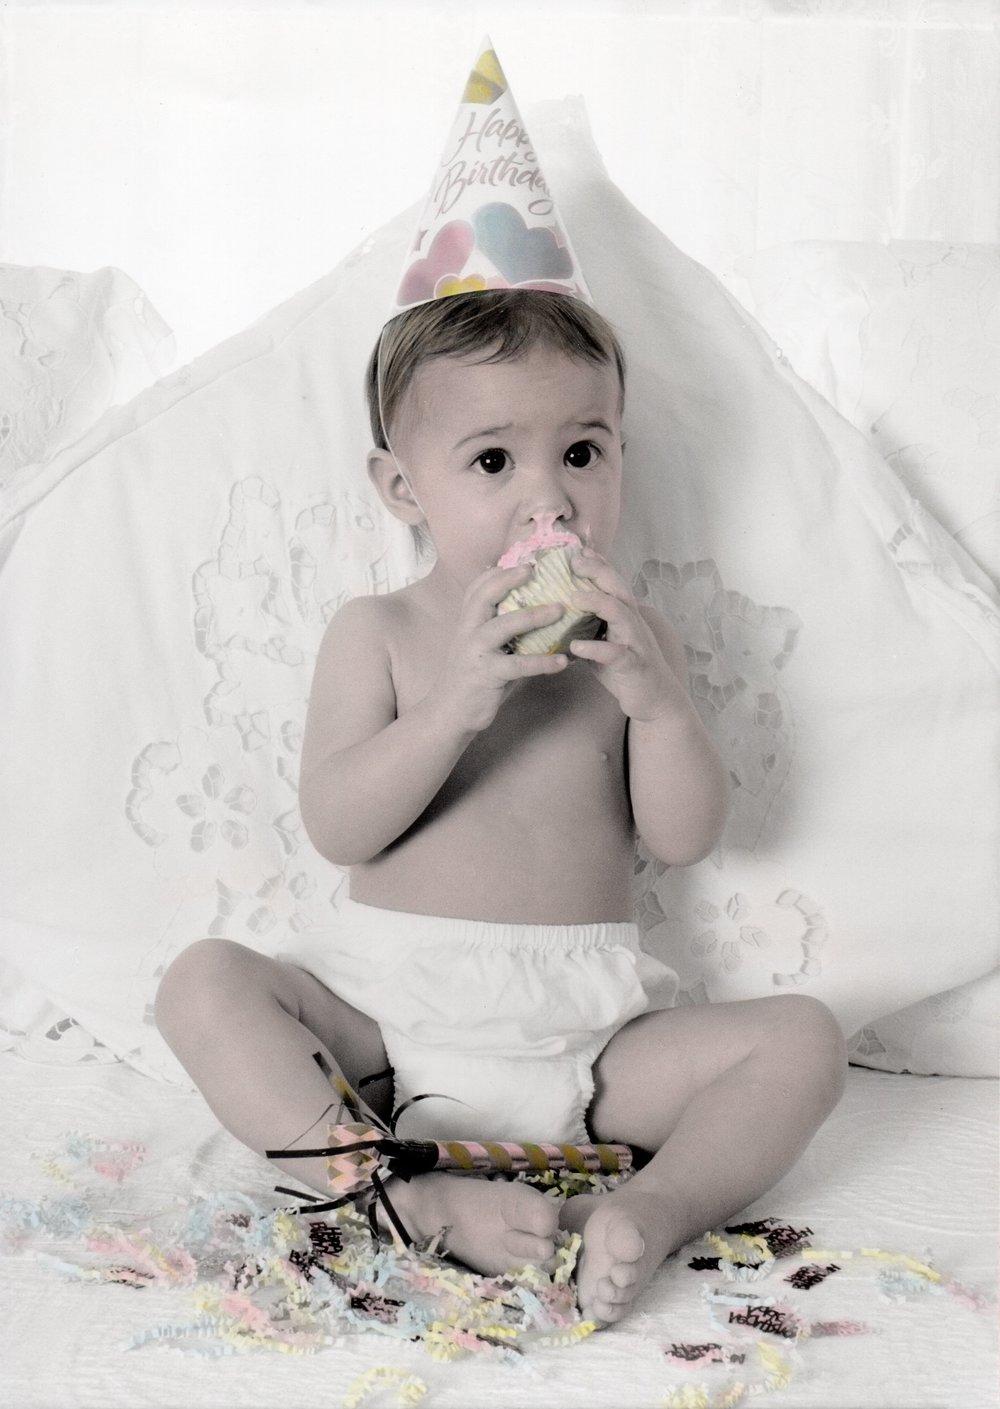 baby029.jpg